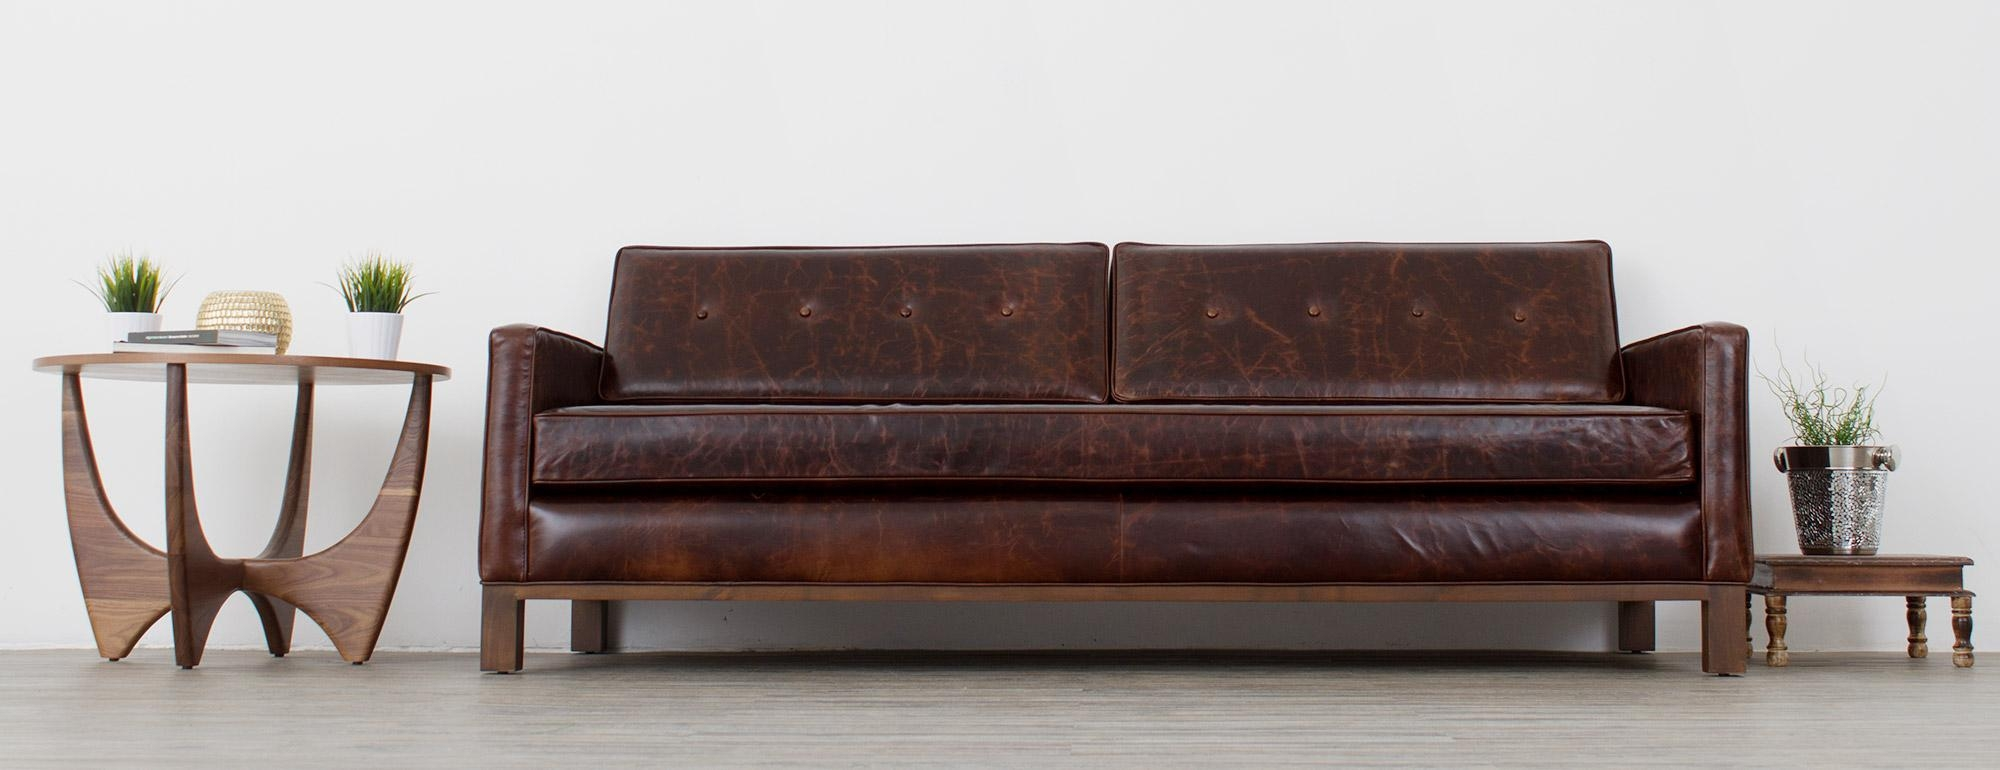 Raine Leather Sofa Joybird Brompton Leather Sofa ~ Hmmi In Brompton Leather Sofas (View 6 of 20)